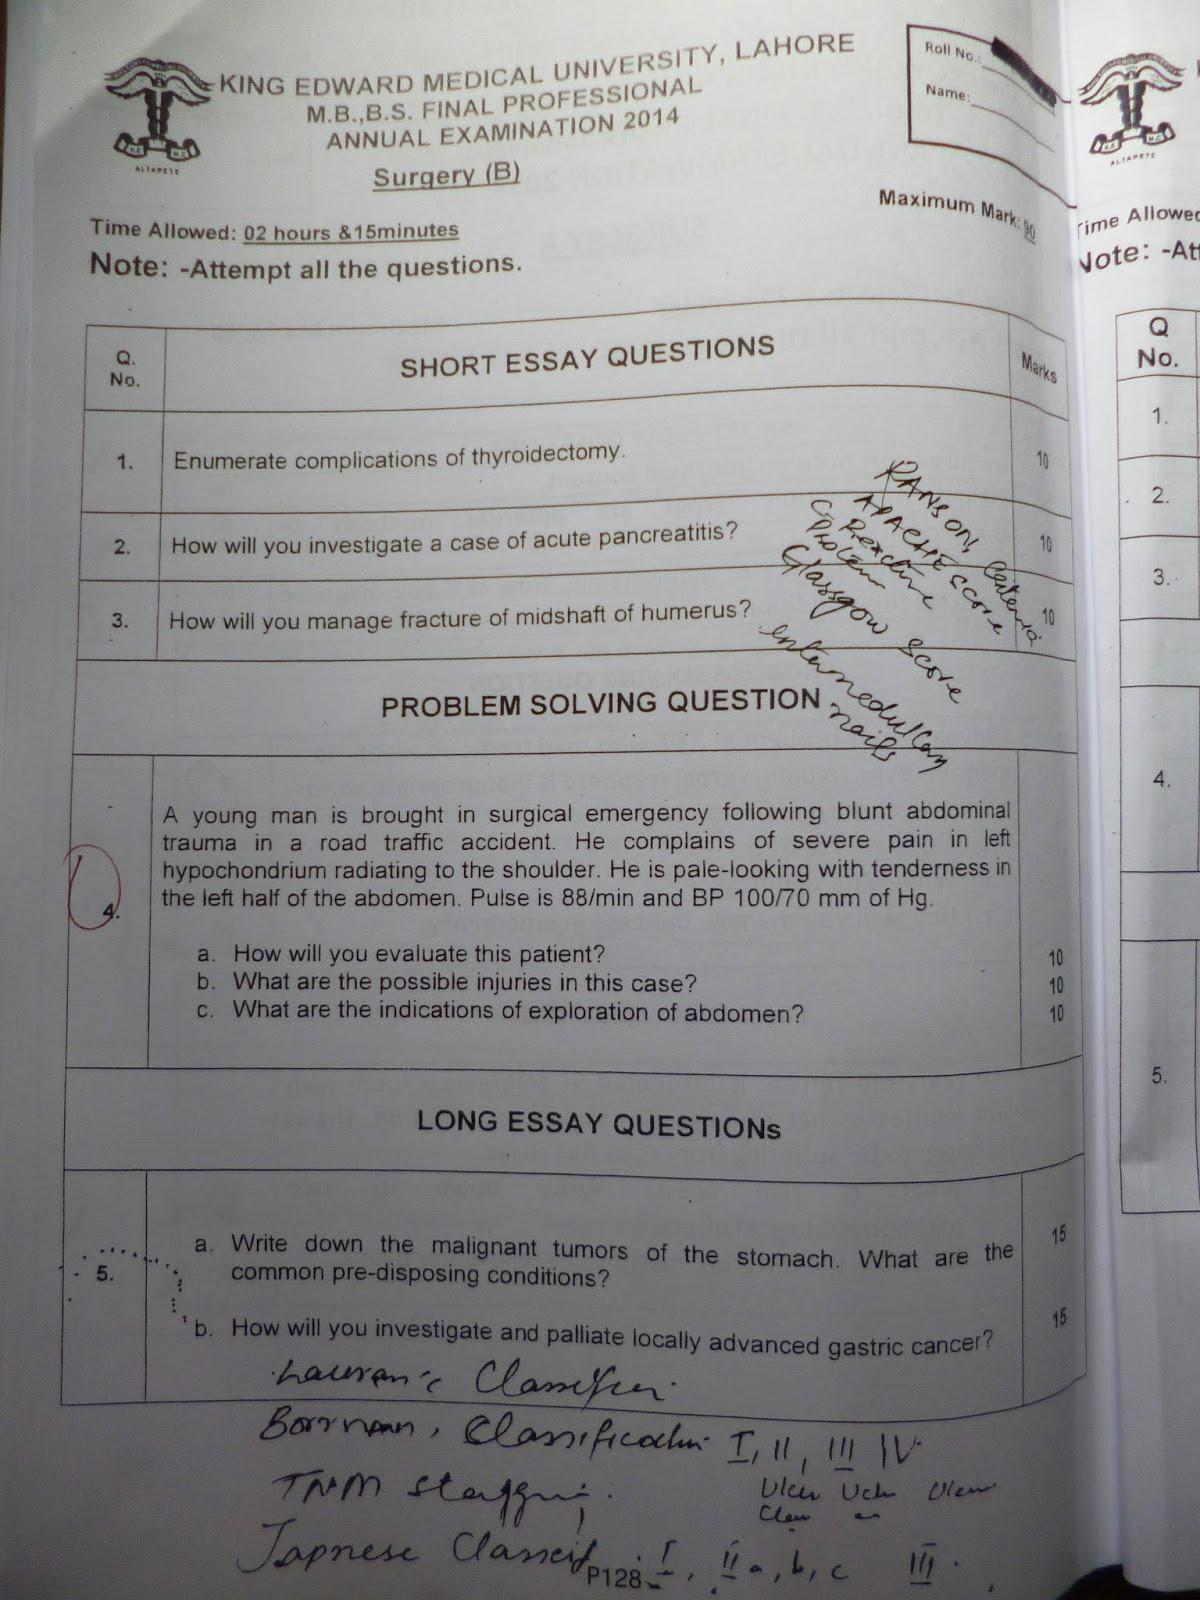 professional resume editor service for school essay transfer